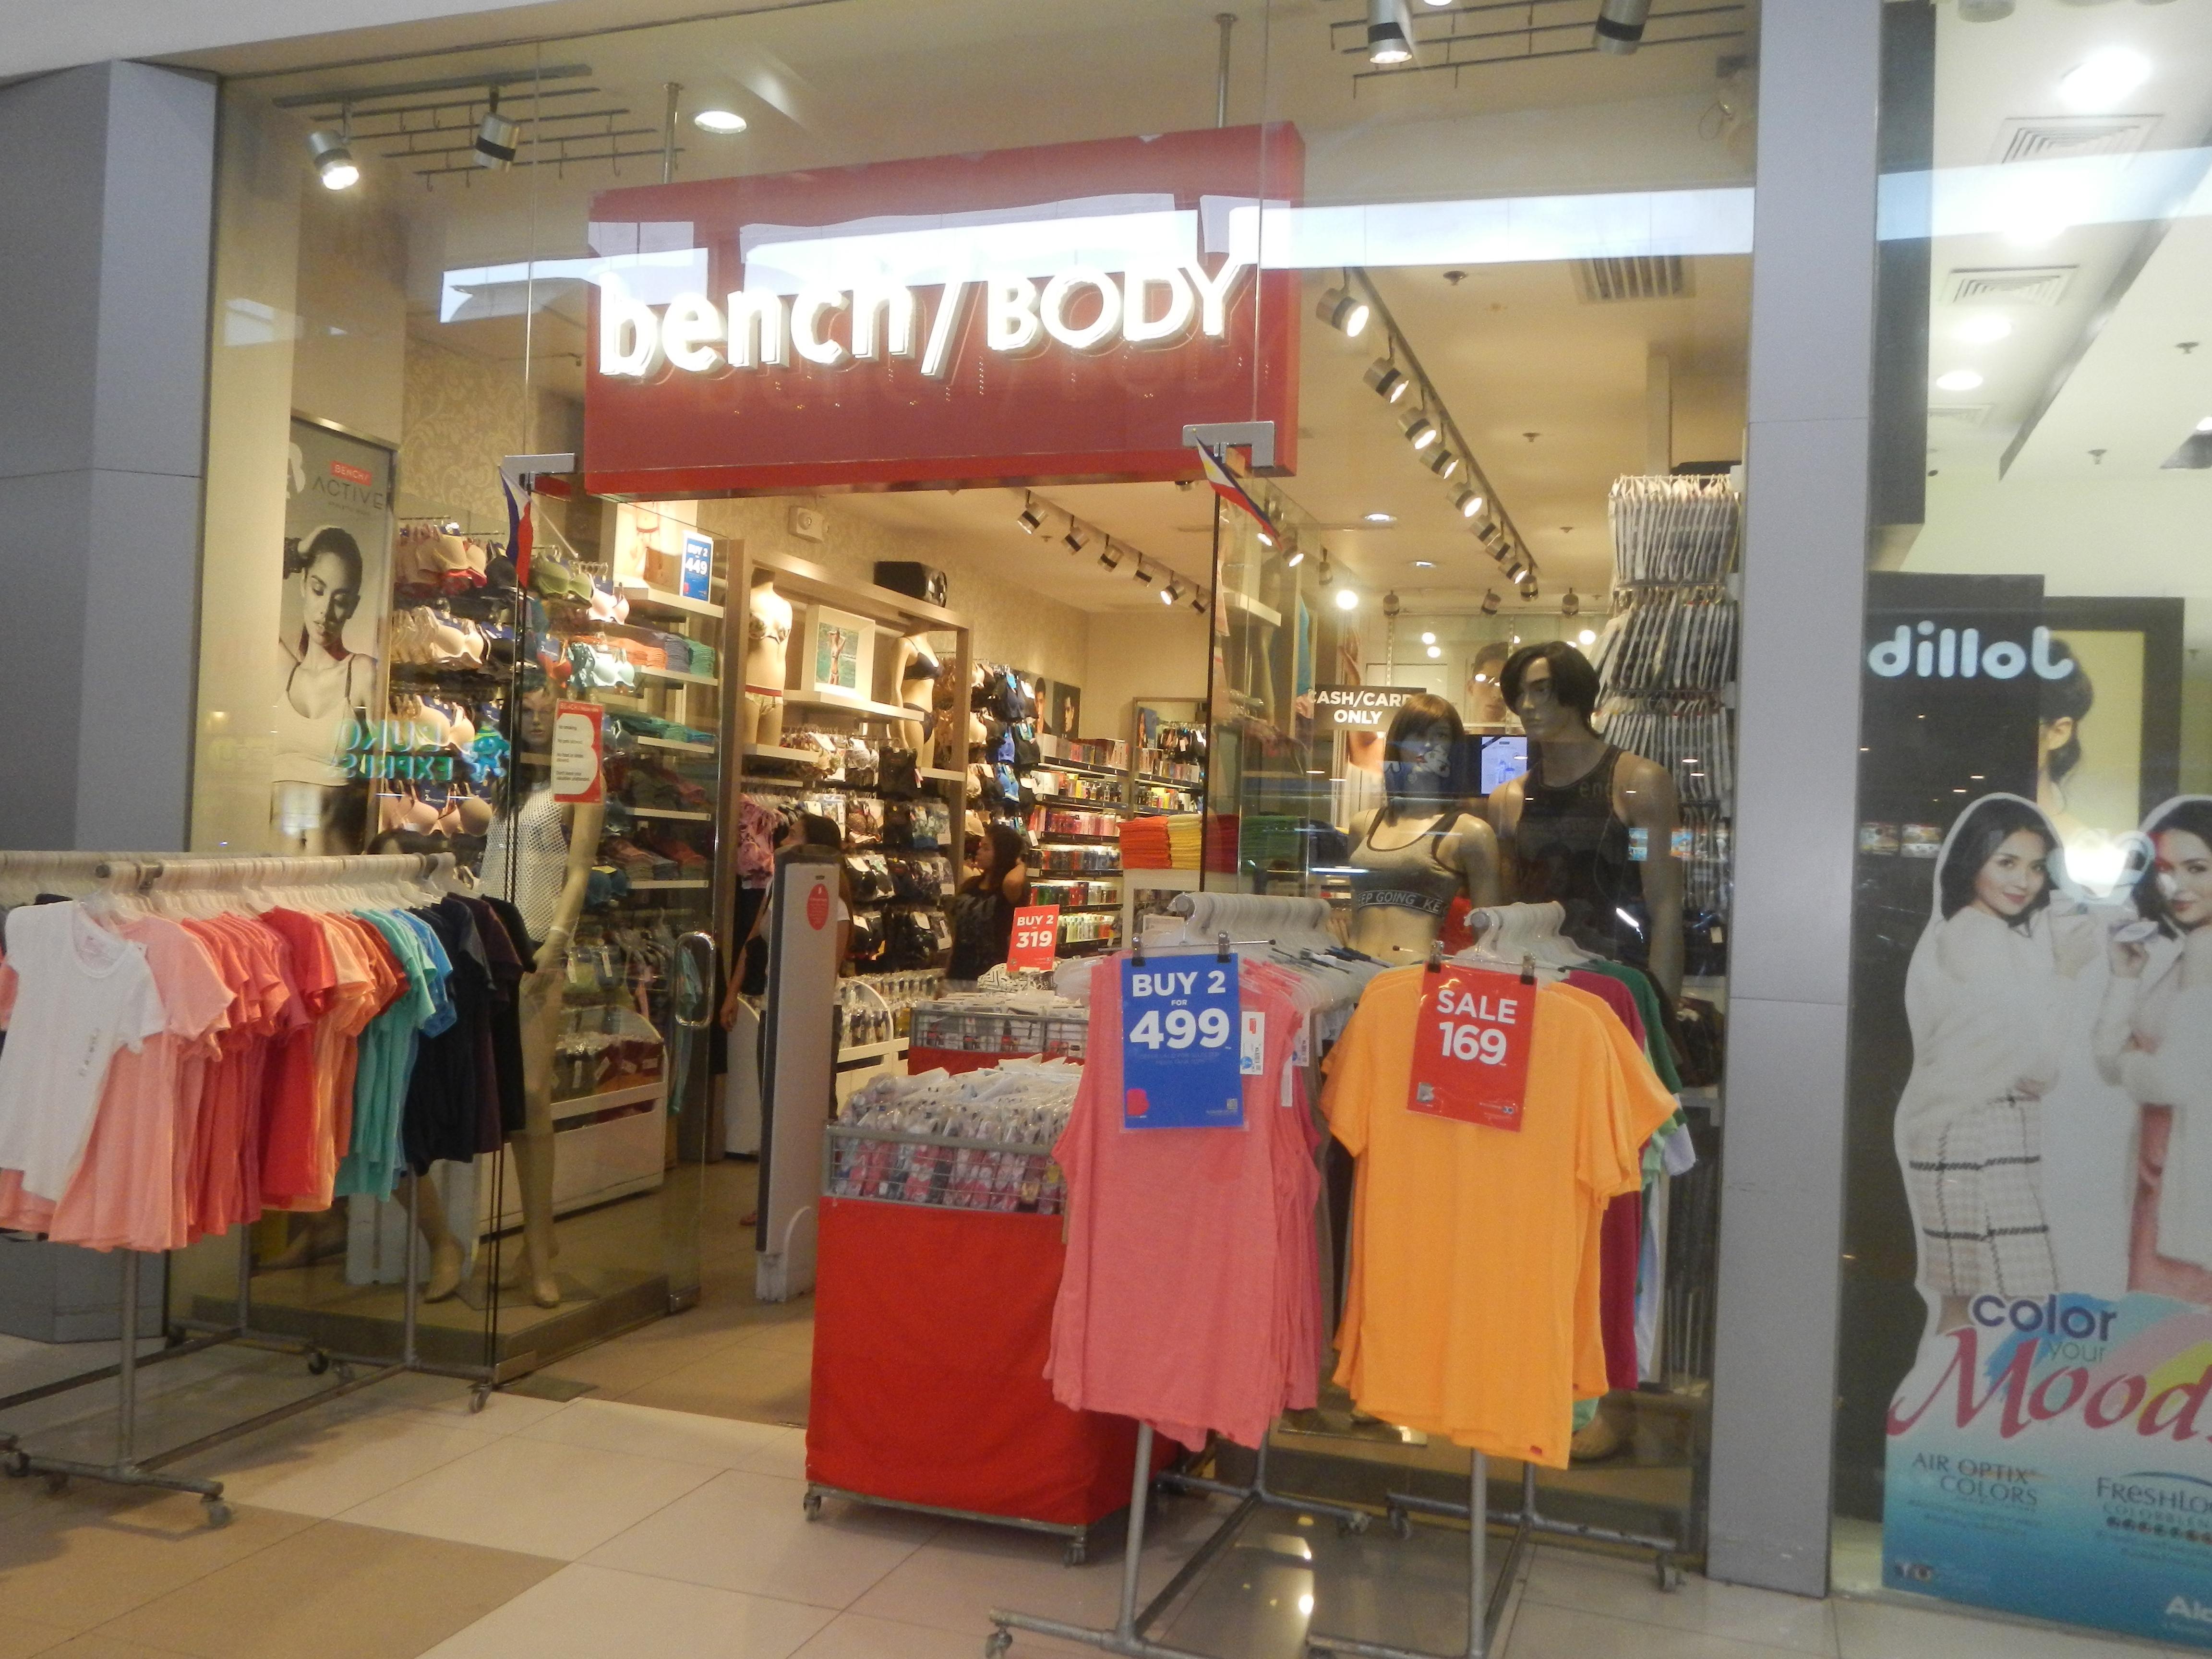 Bench Philippine Clothing Brand Wikipedia